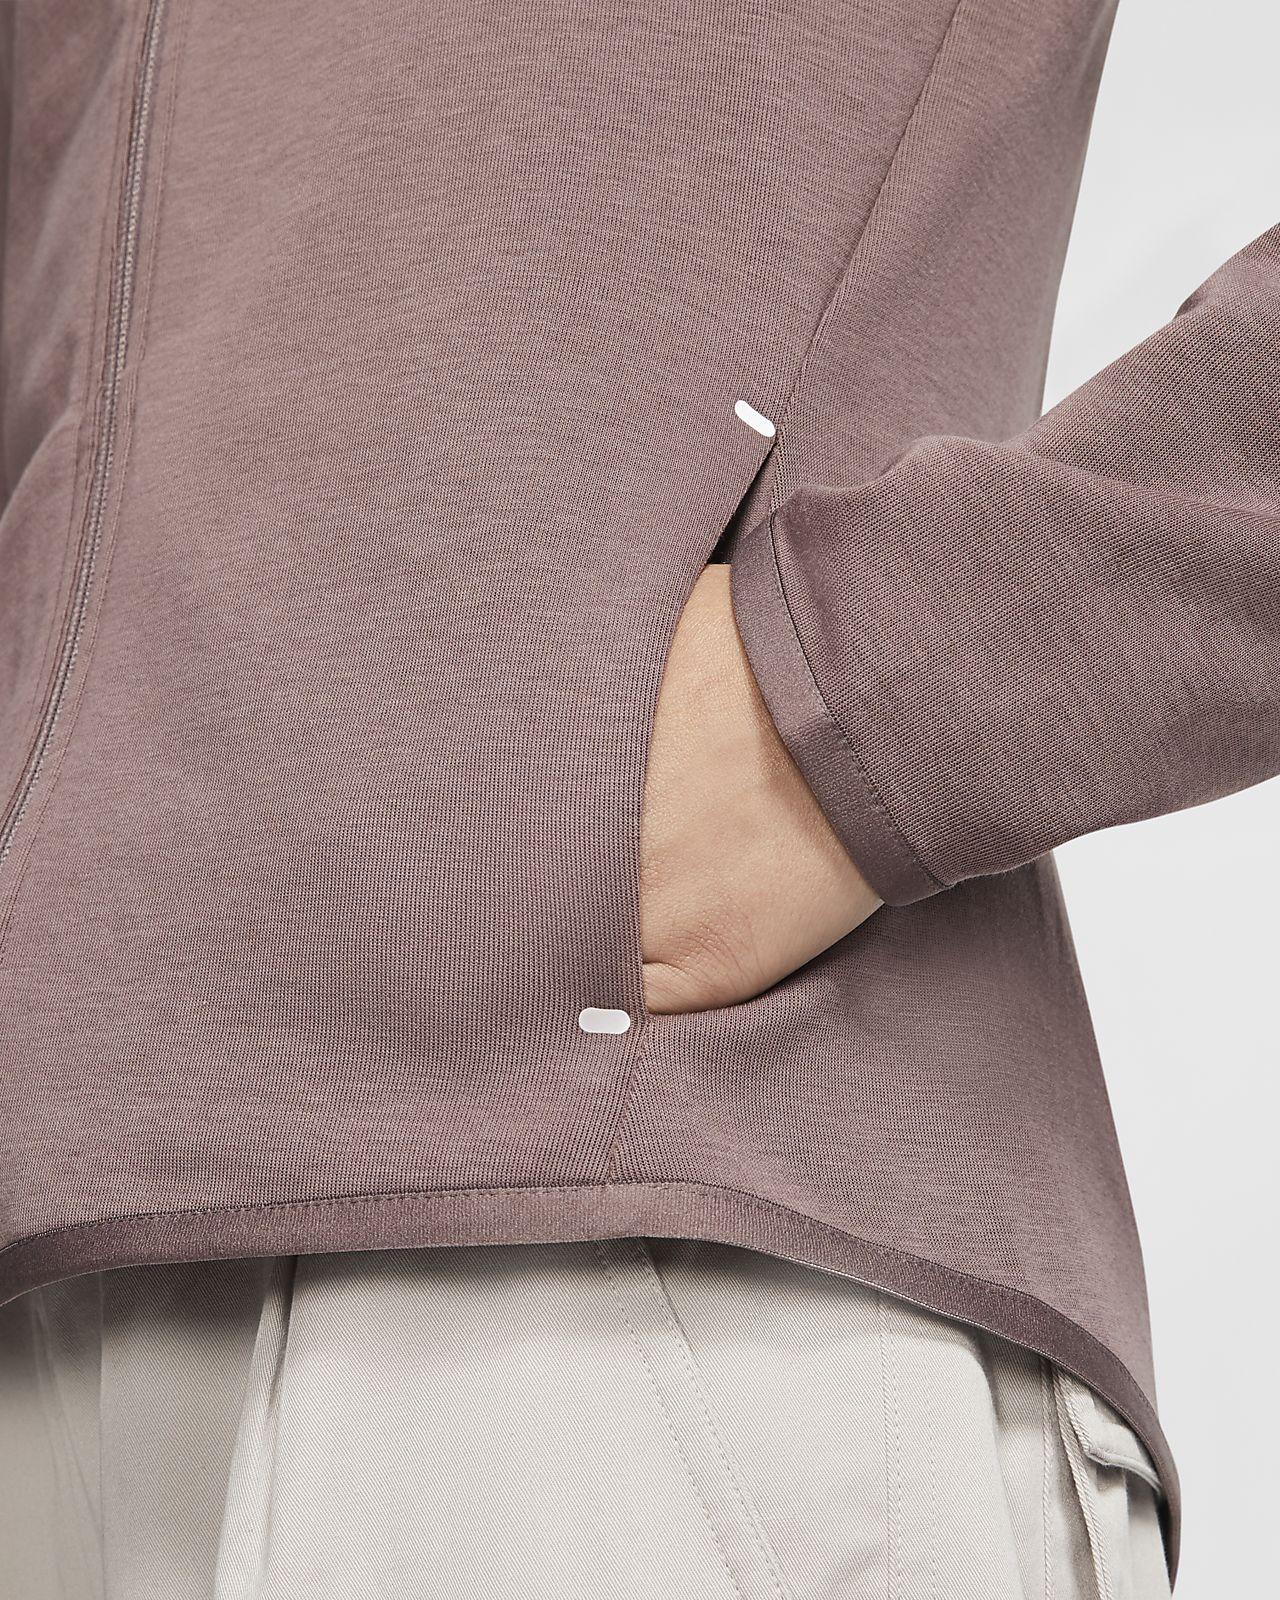 Nike Sportswear Windrunner Tech Fleece Damen Hoodie mit durchgehendem Reißverschluss